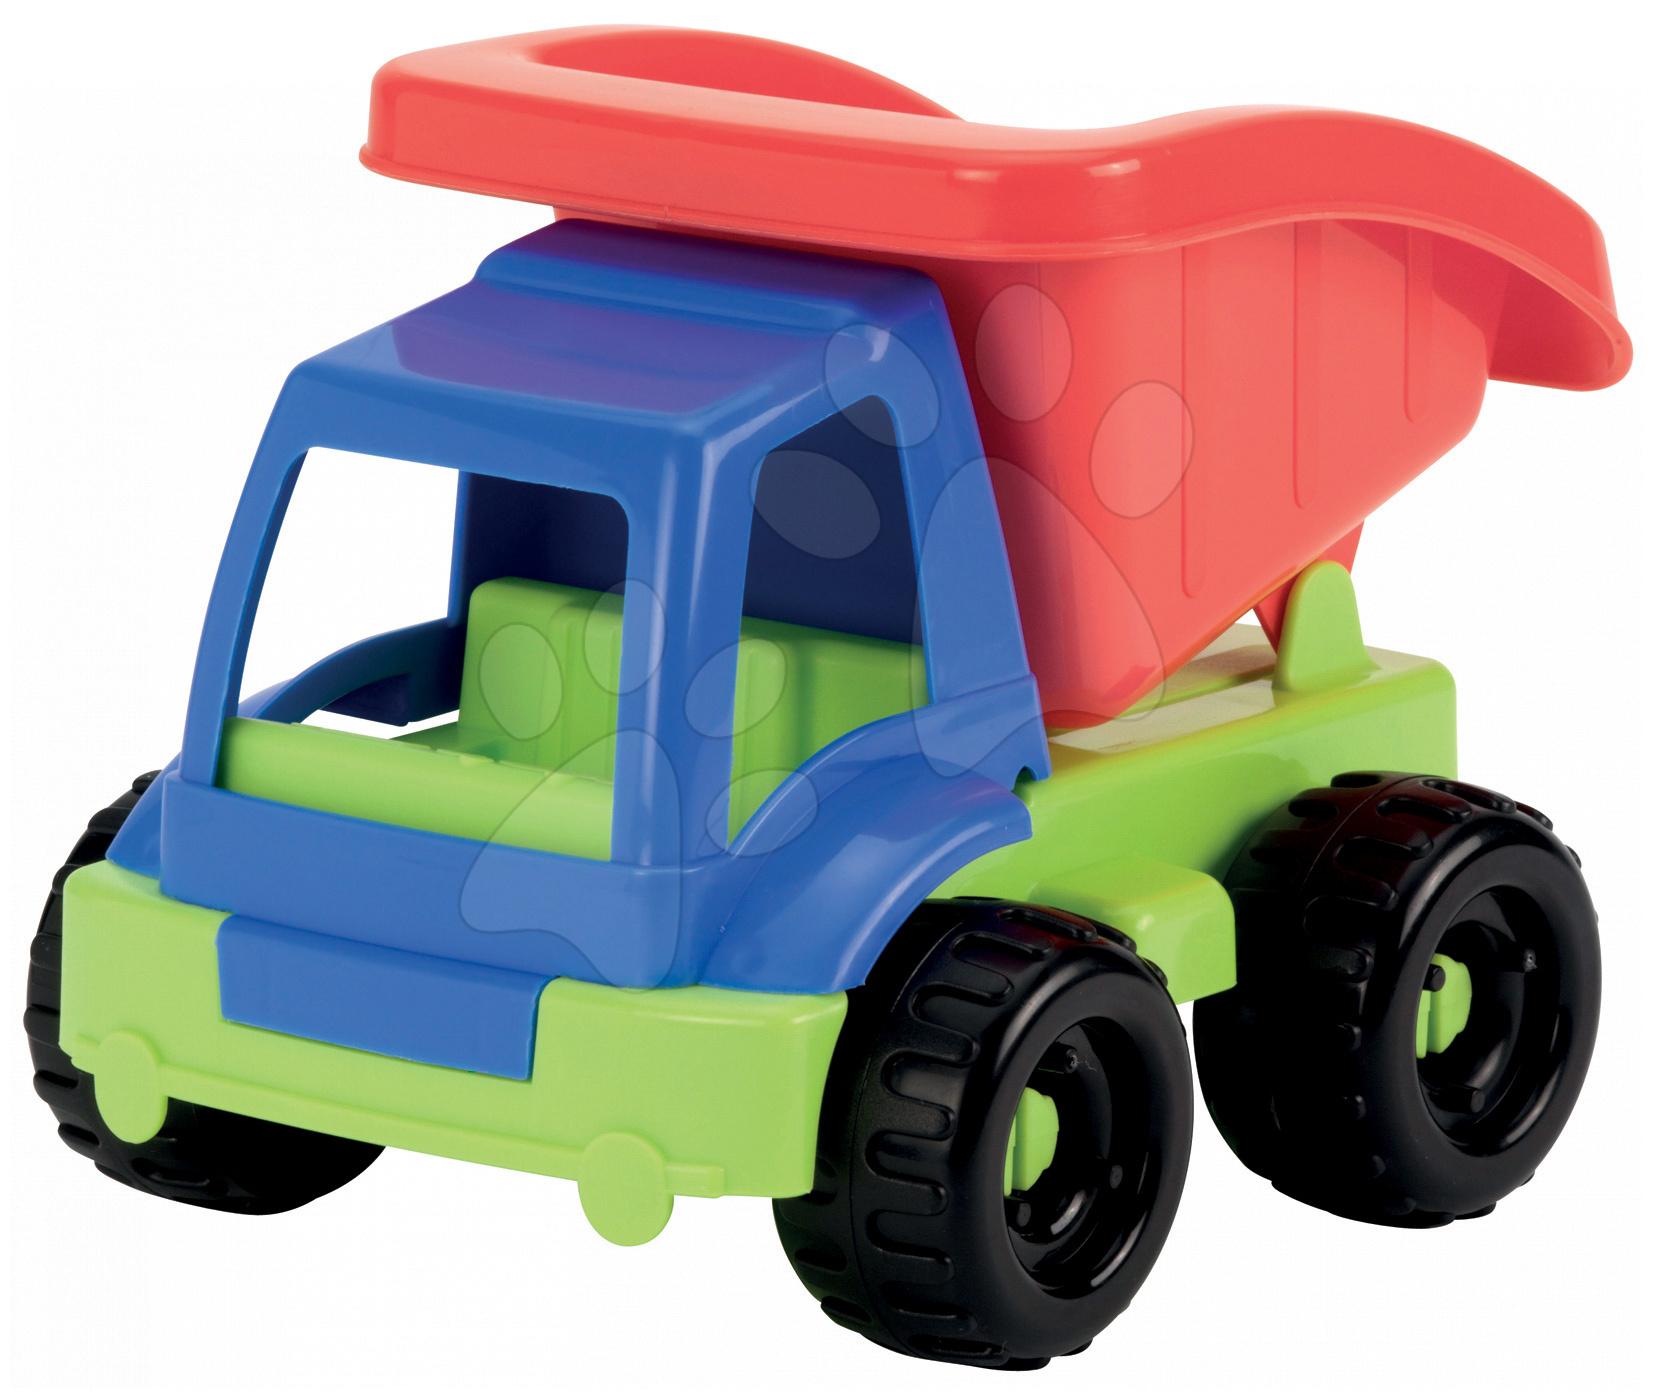 Nákladné autá - Autíčko - vyklápačka Écoiffier pracovné dĺžka 20 cm od 18 mes